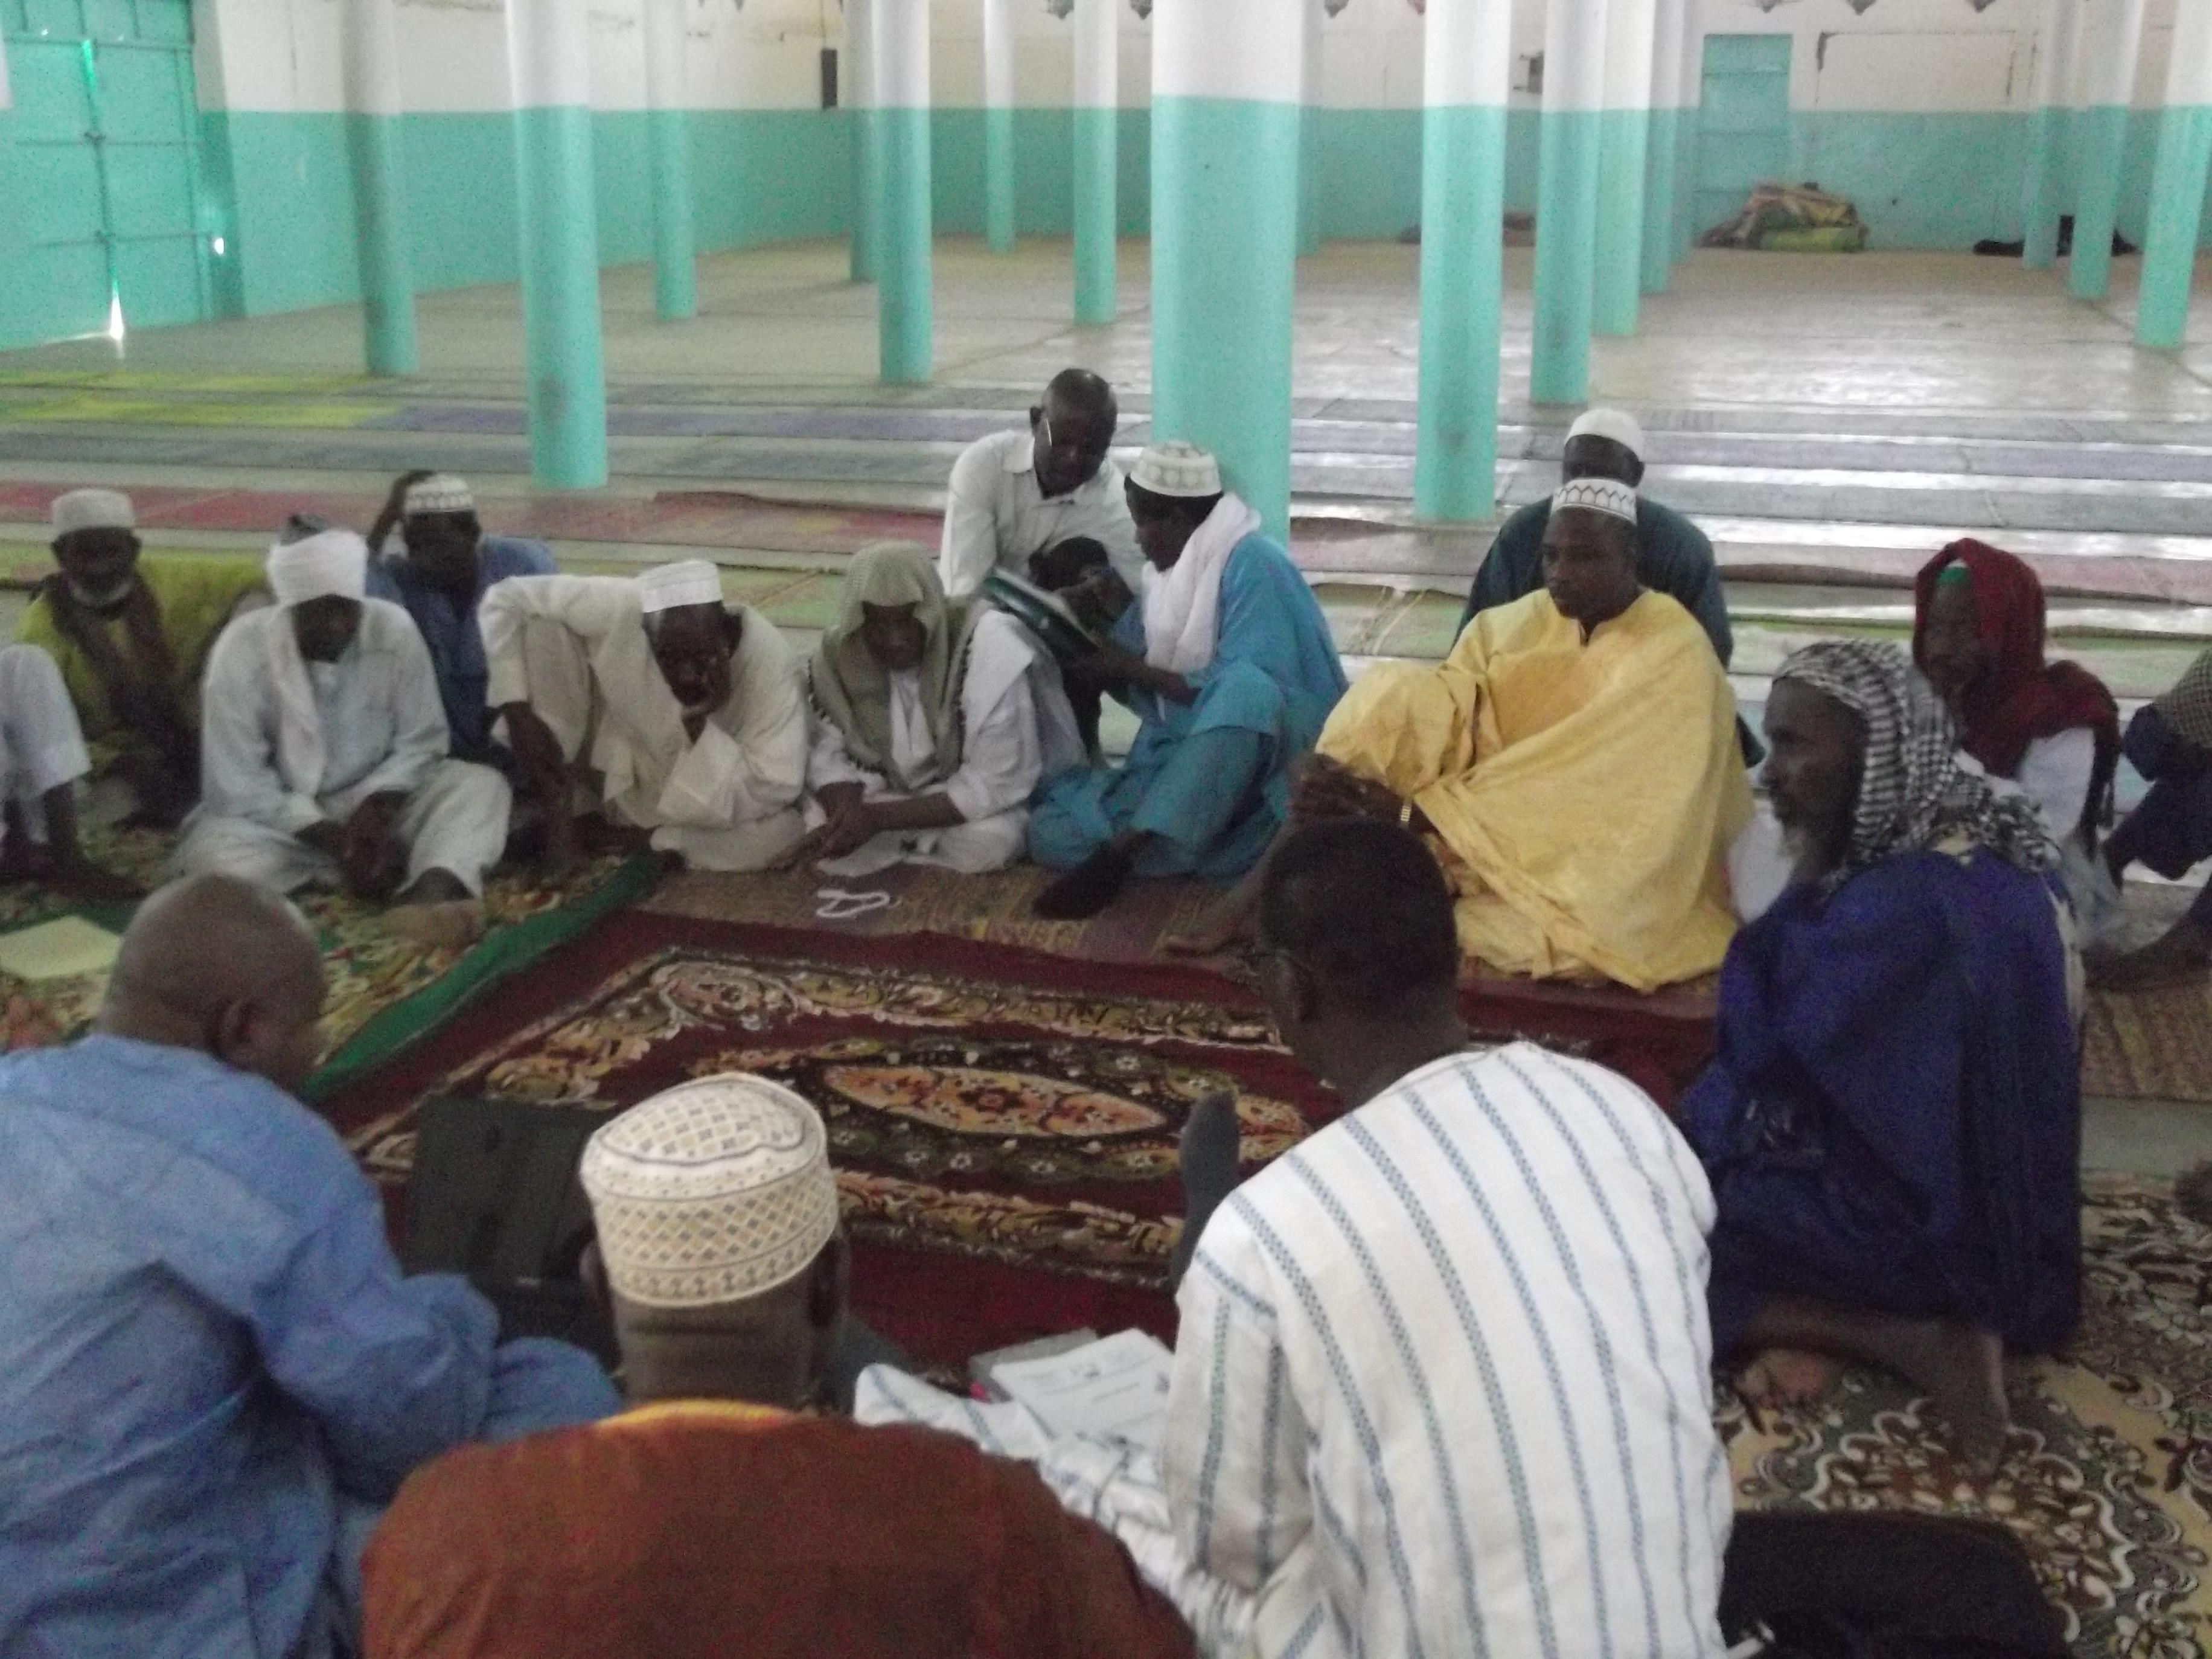 In the spotlight: Salam Institute In Burkina Faso